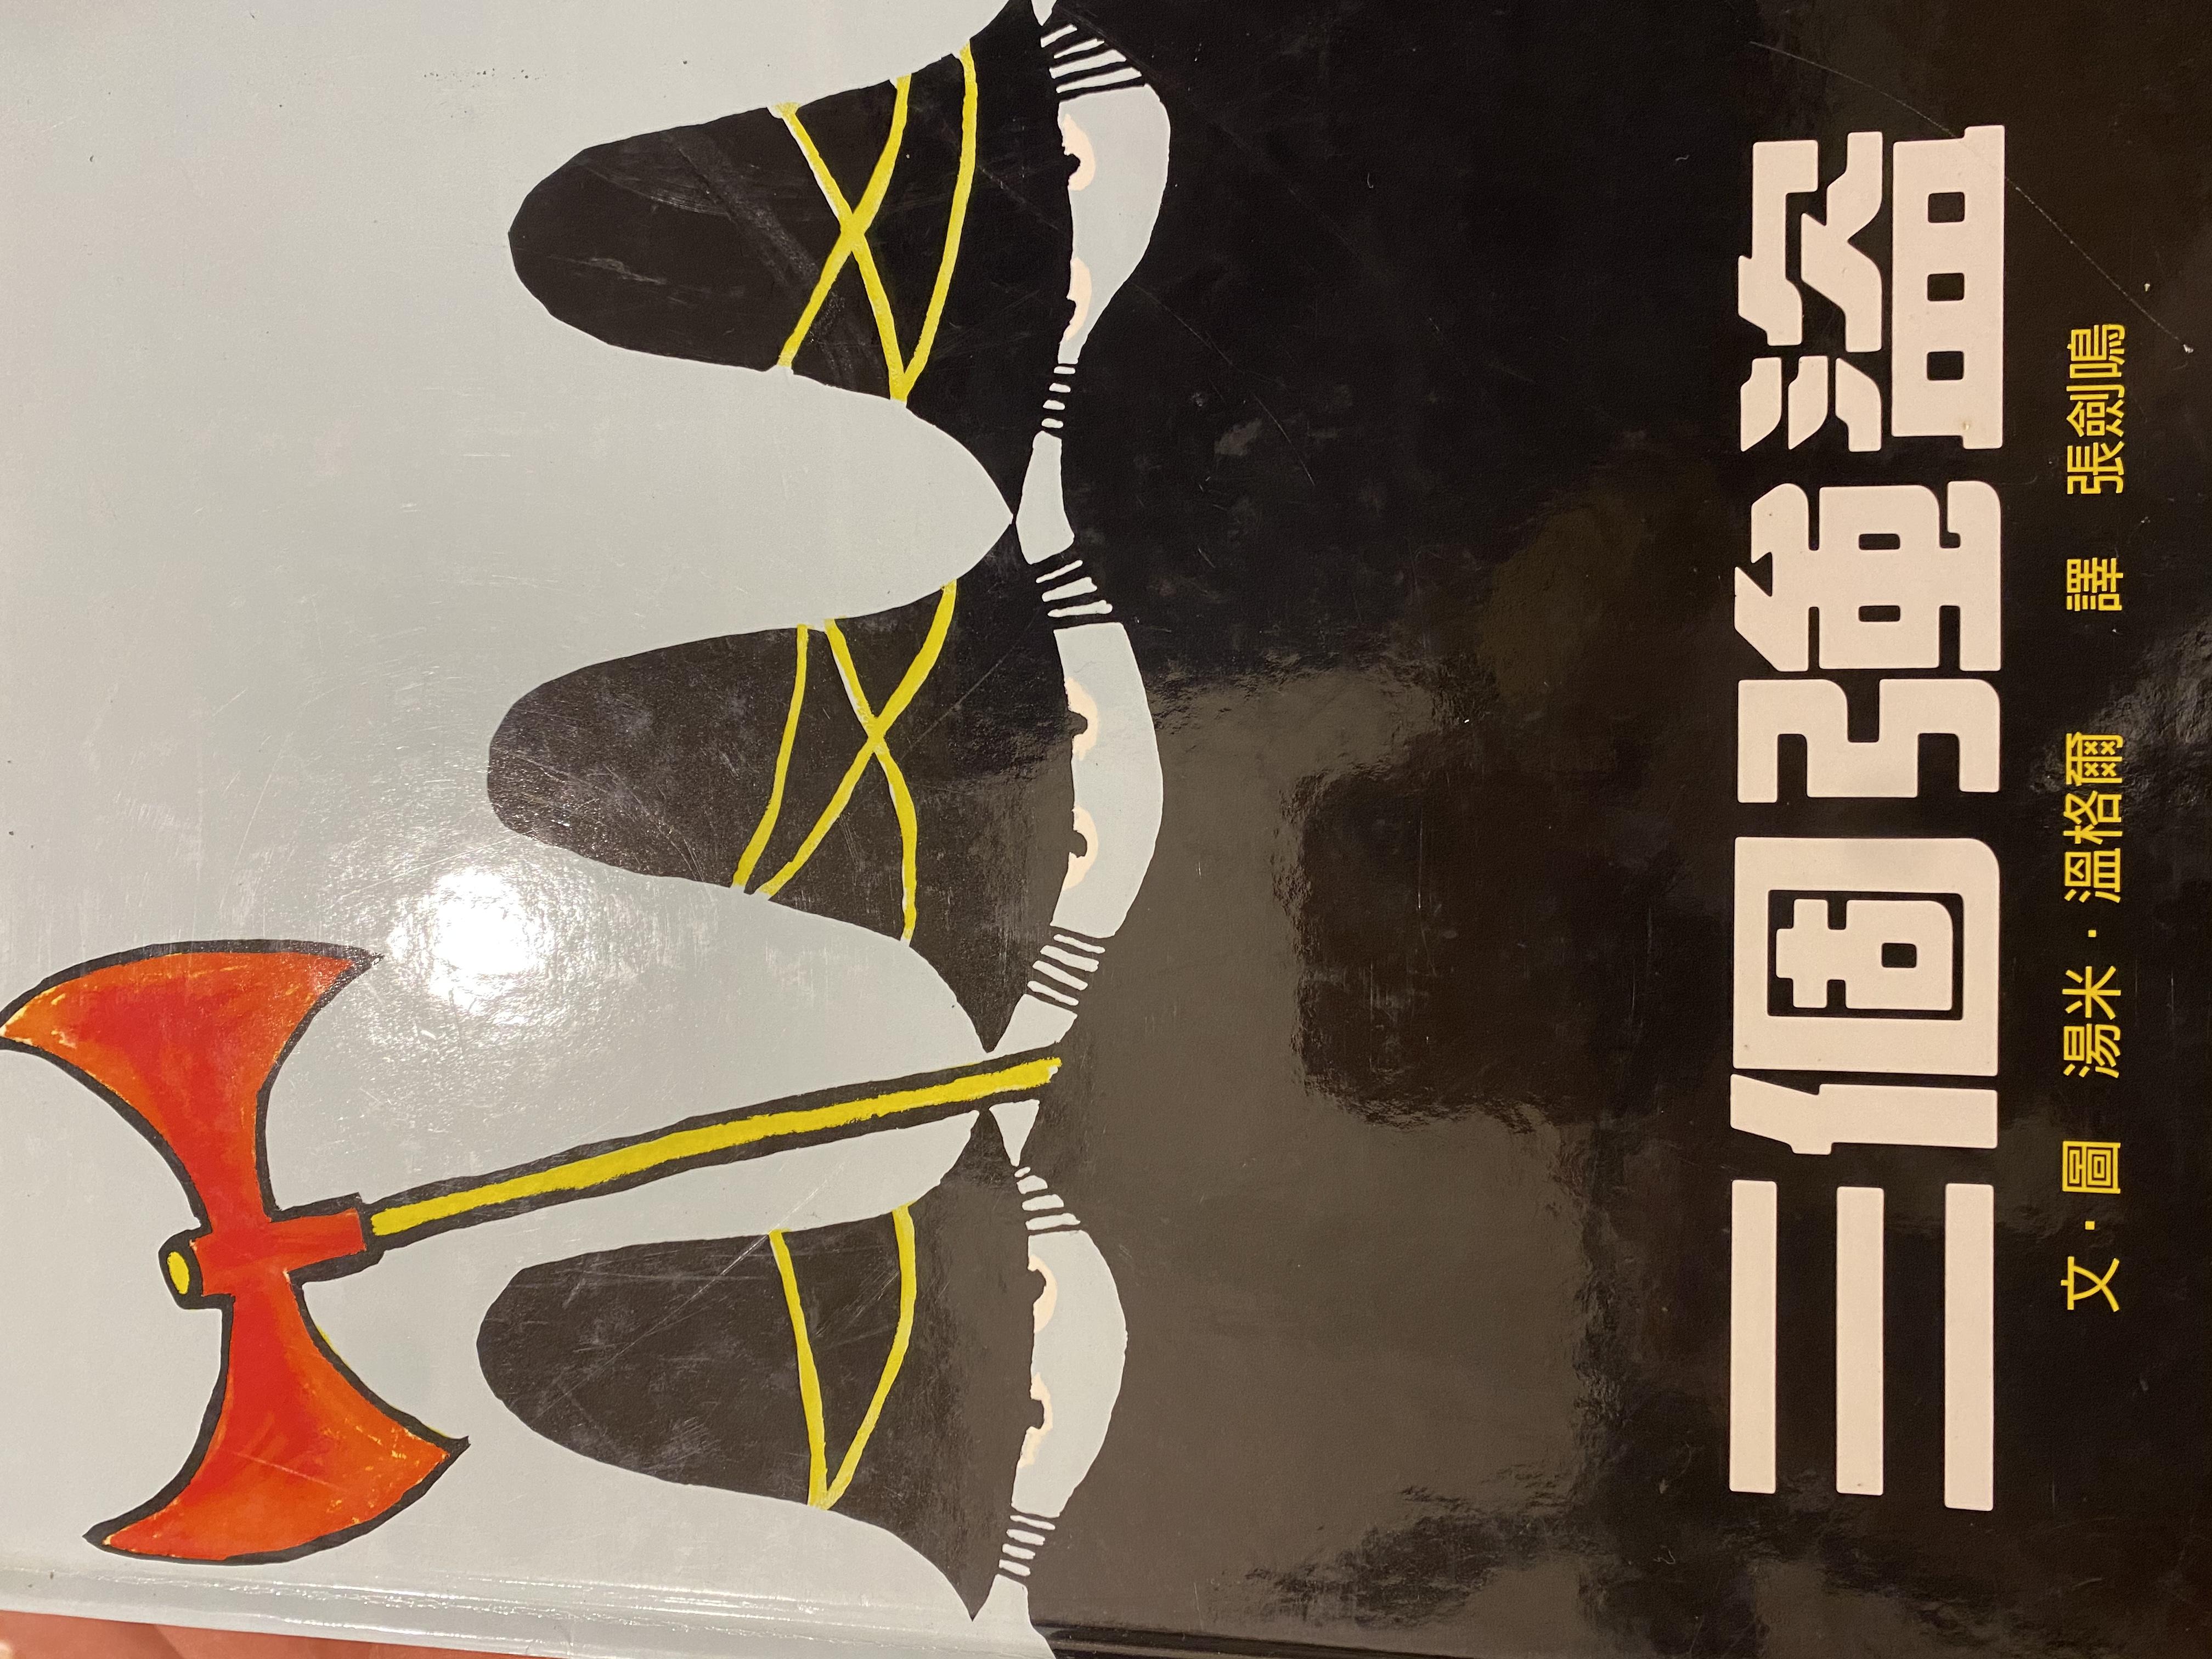 S2-294/ 三個強盜/ 文圖 湯米溫格爾/ 譯 張劍鳴/ 上誼出版社